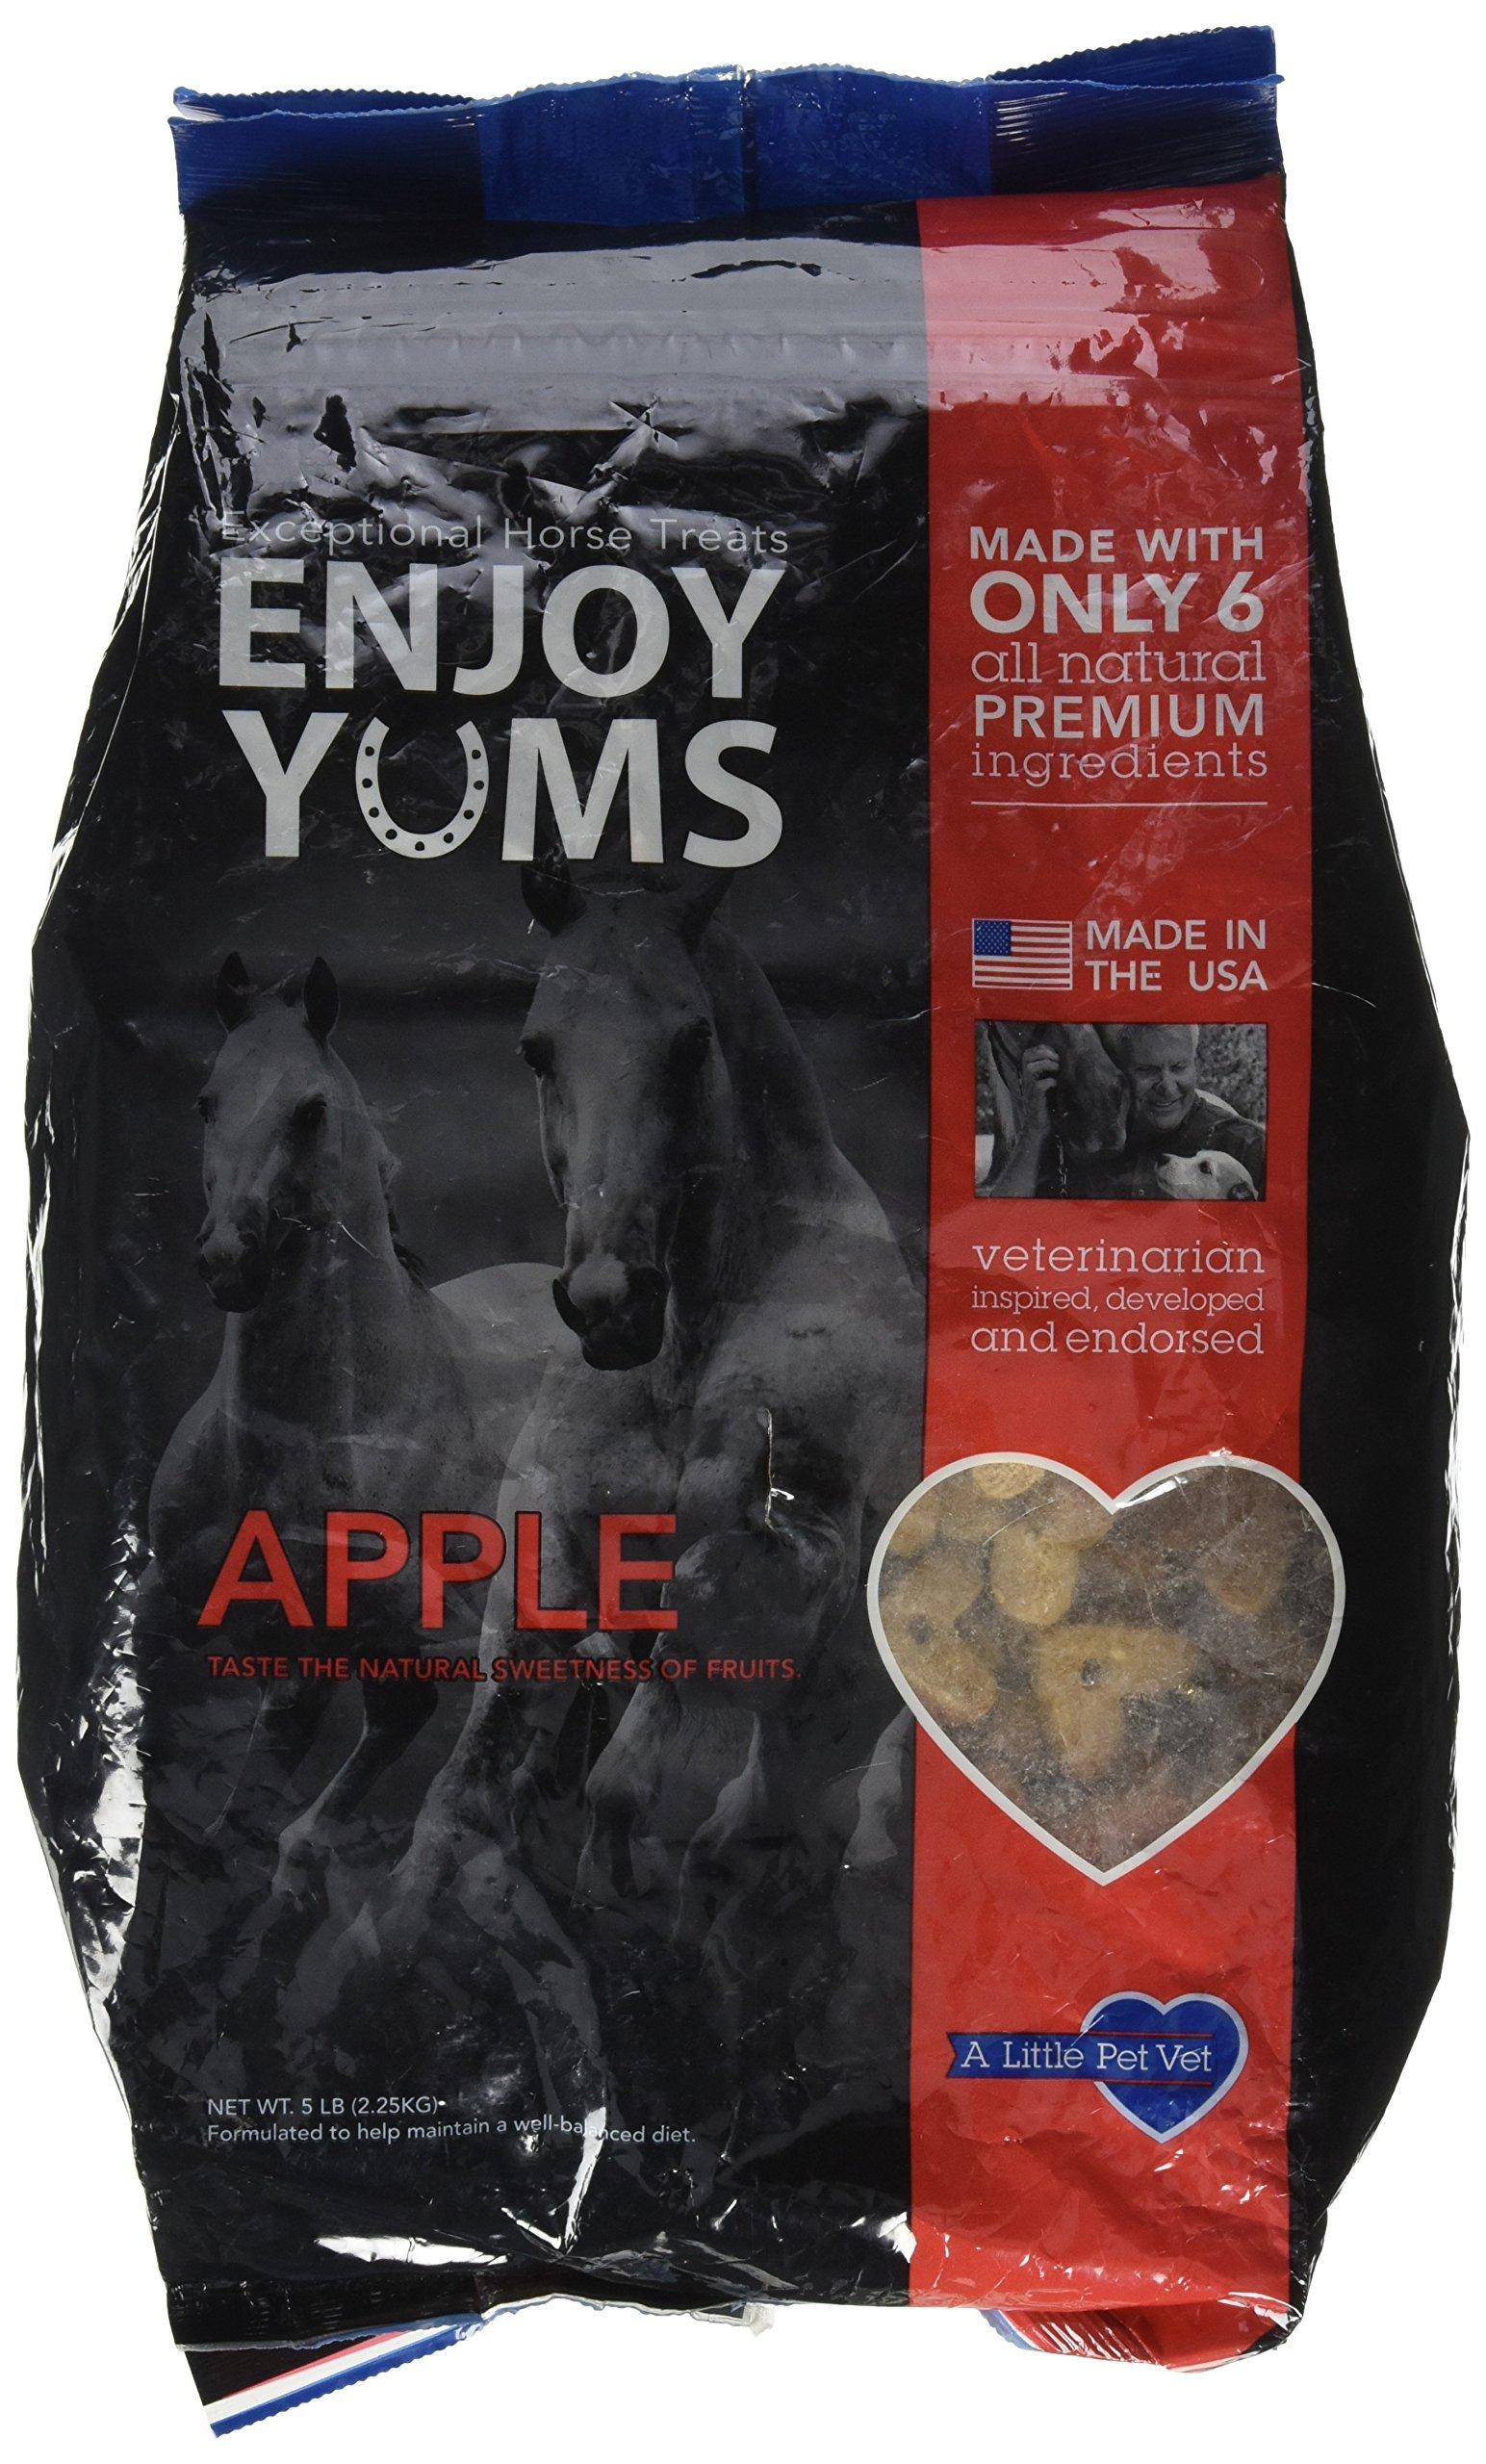 A Little Pet Vet Enjoy YUMS Horse Treats 5 lb Apple by A Little Pet Vet